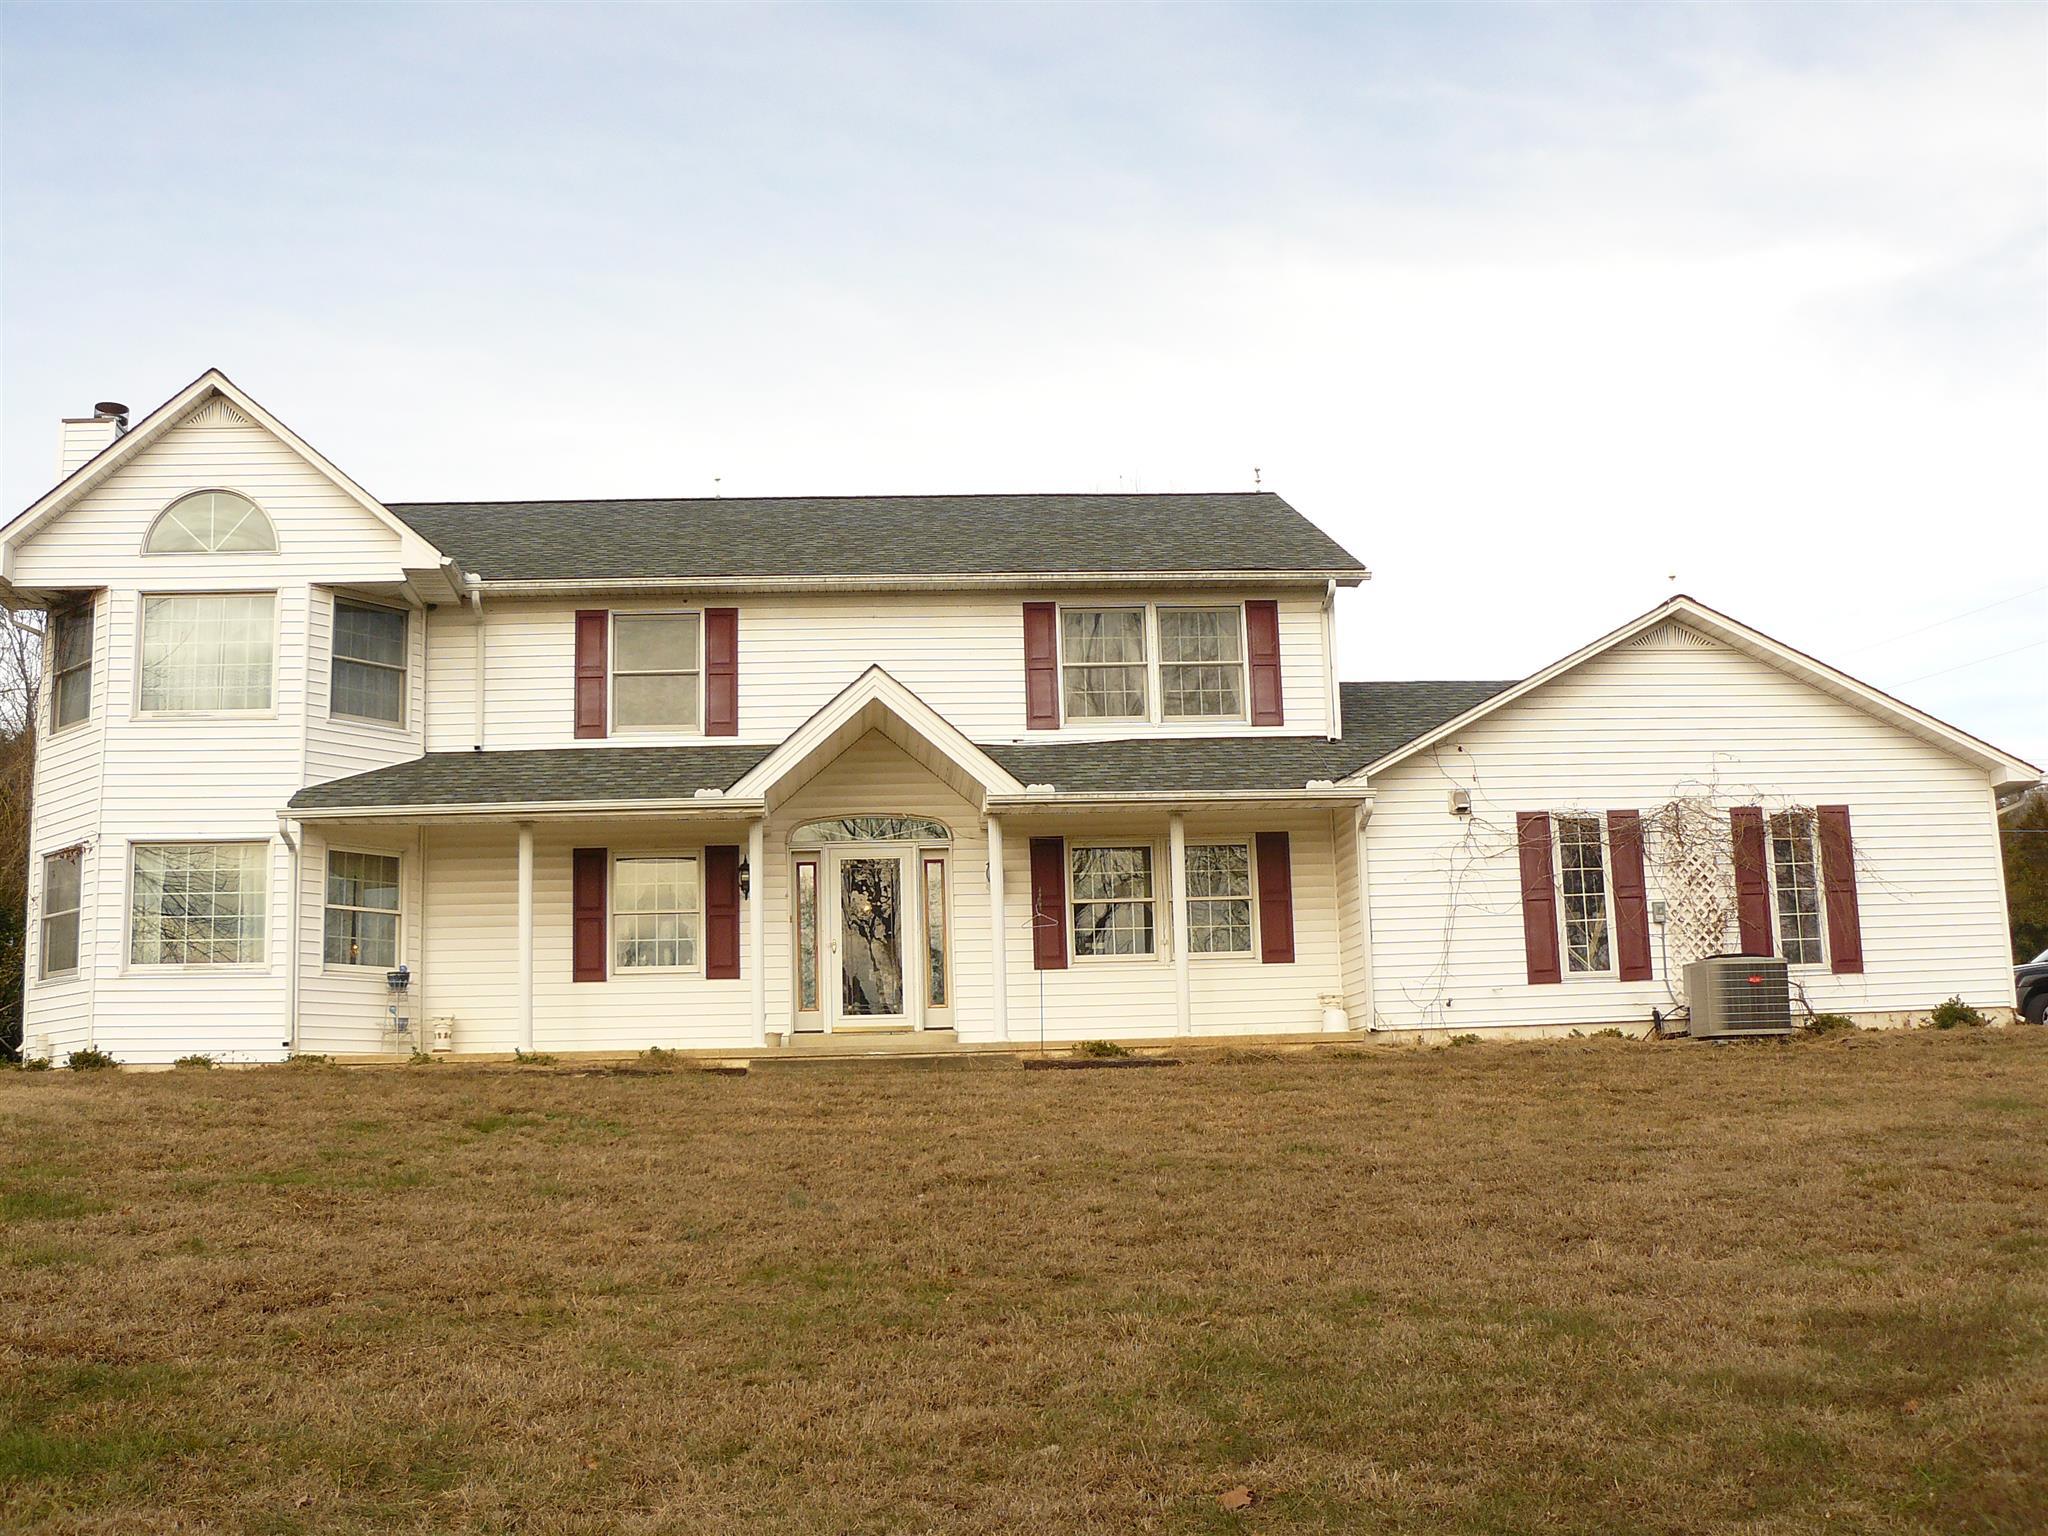 2190 Old Highway 25, Hartsville, TN 37074